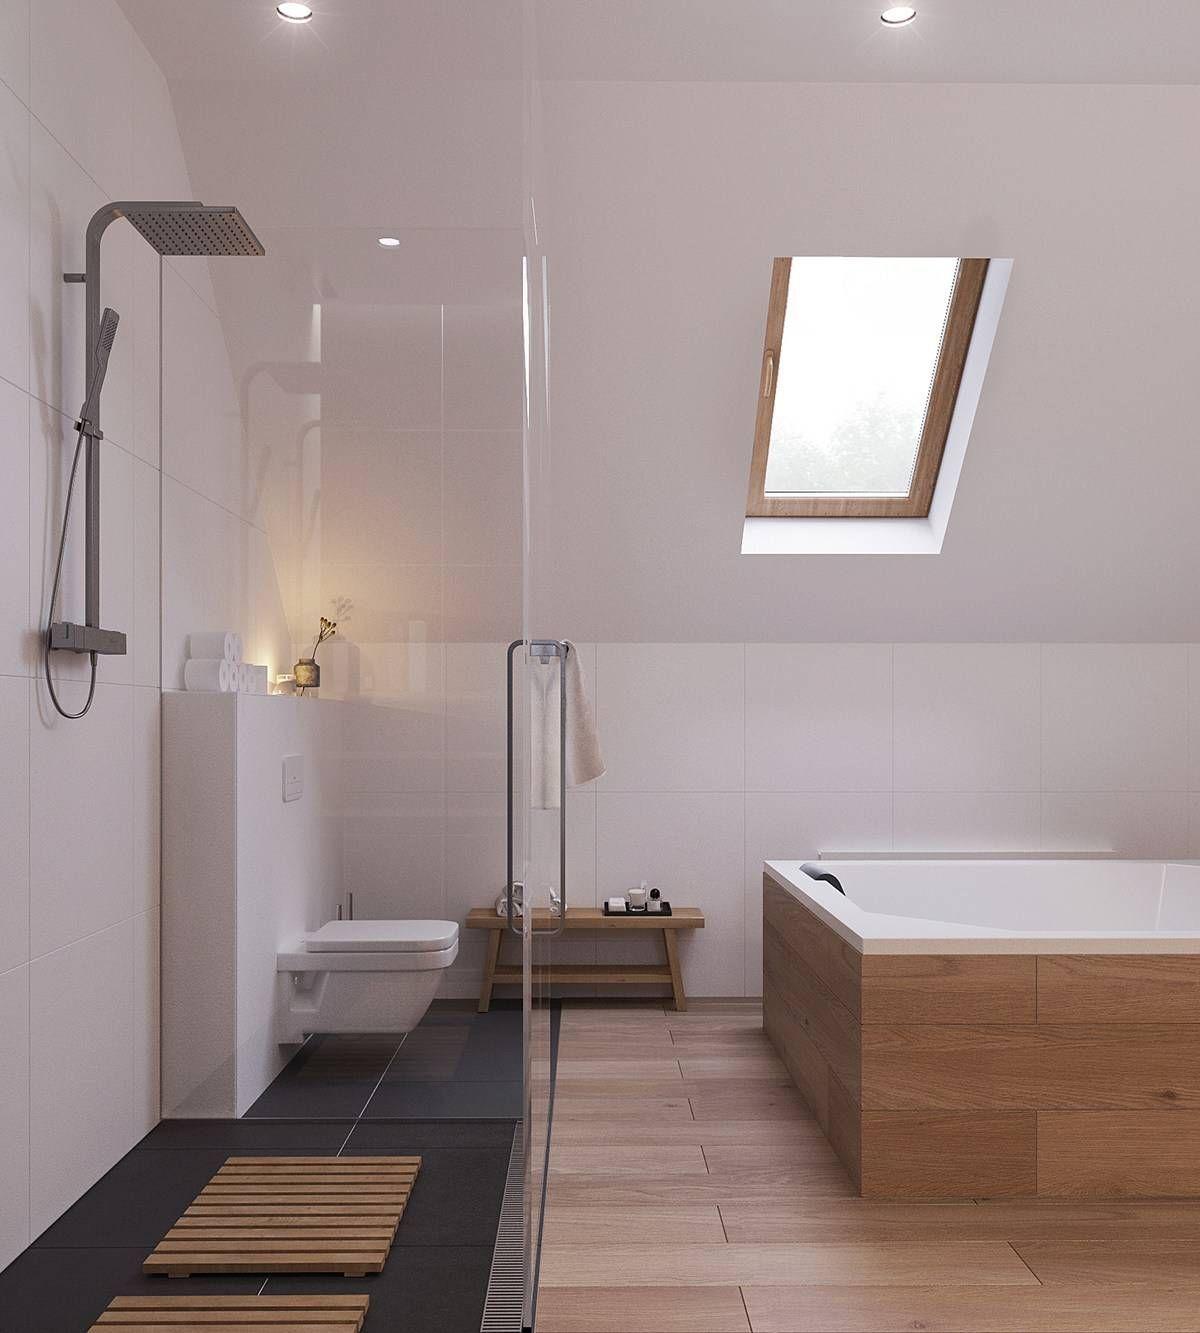 Originale appartamento stile scandinavo moderno. Design